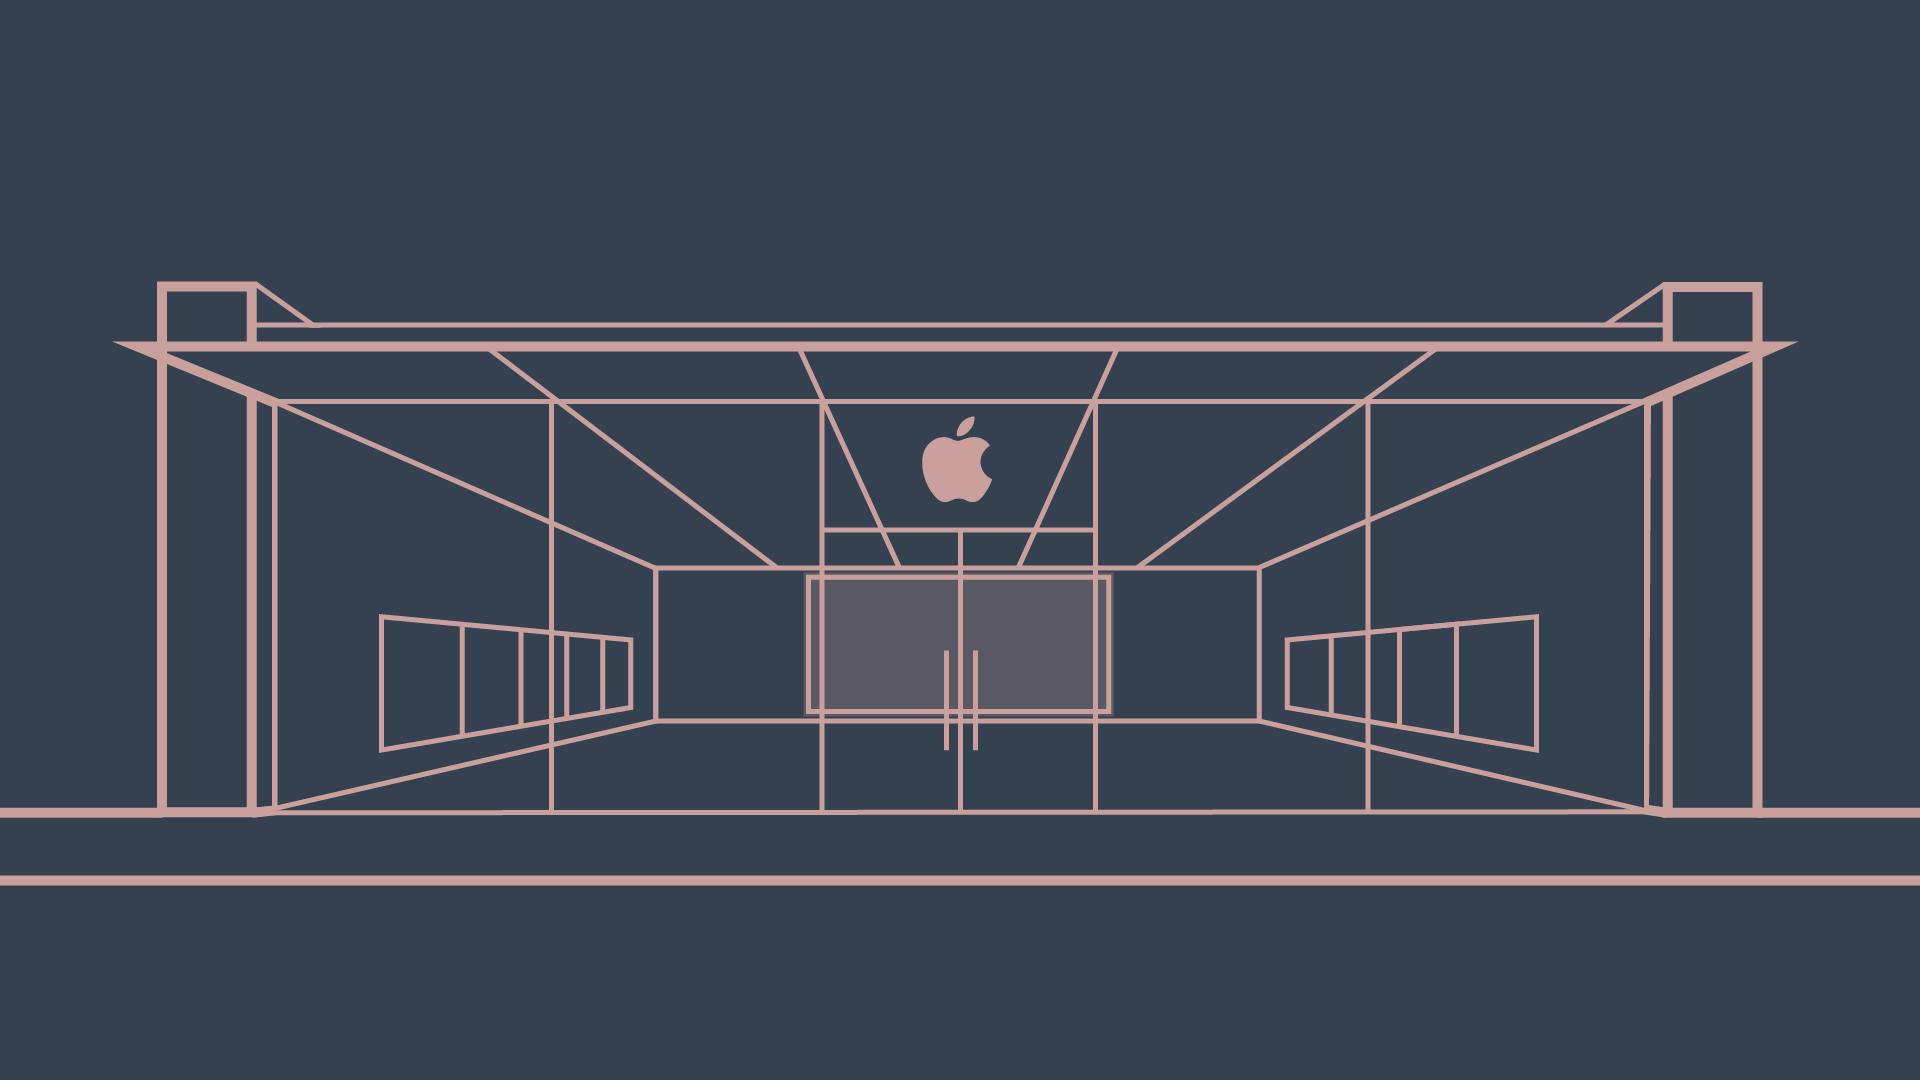 Alderwood Mall 100 - Redesigned Apple Alderwood Mall opens November 17th